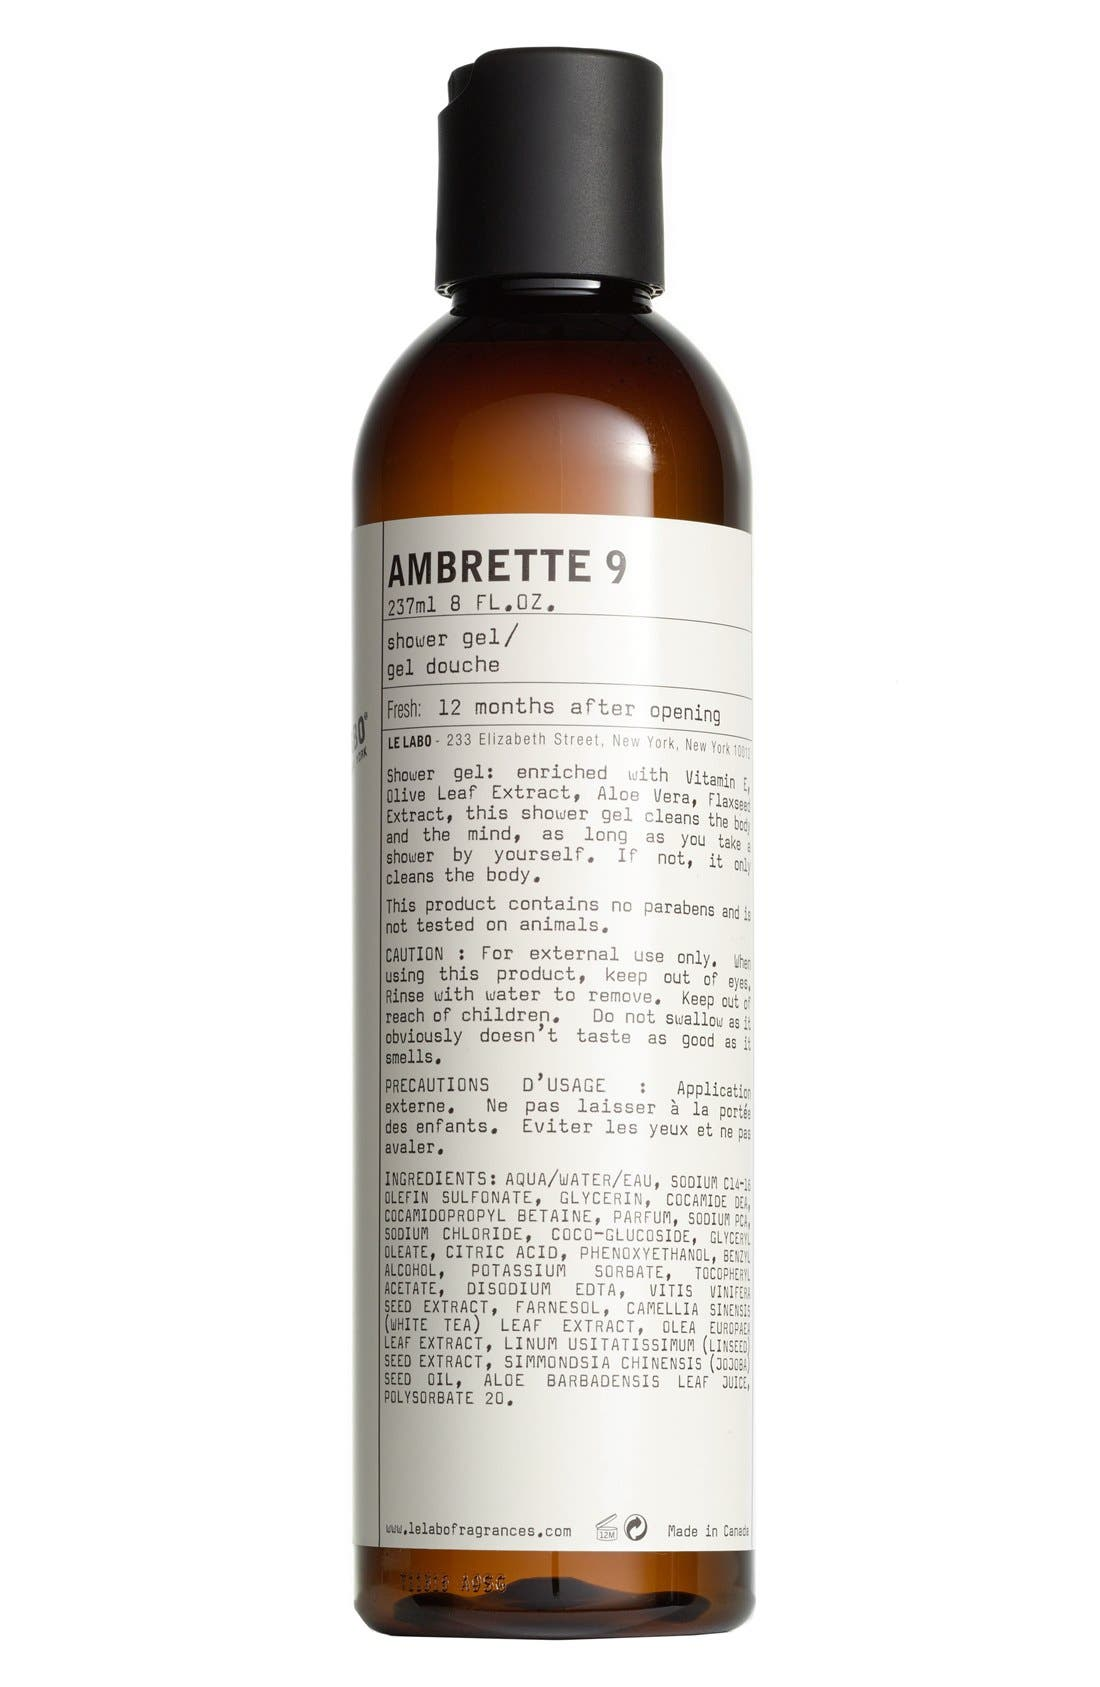 Ambrette 9 Shower Gel